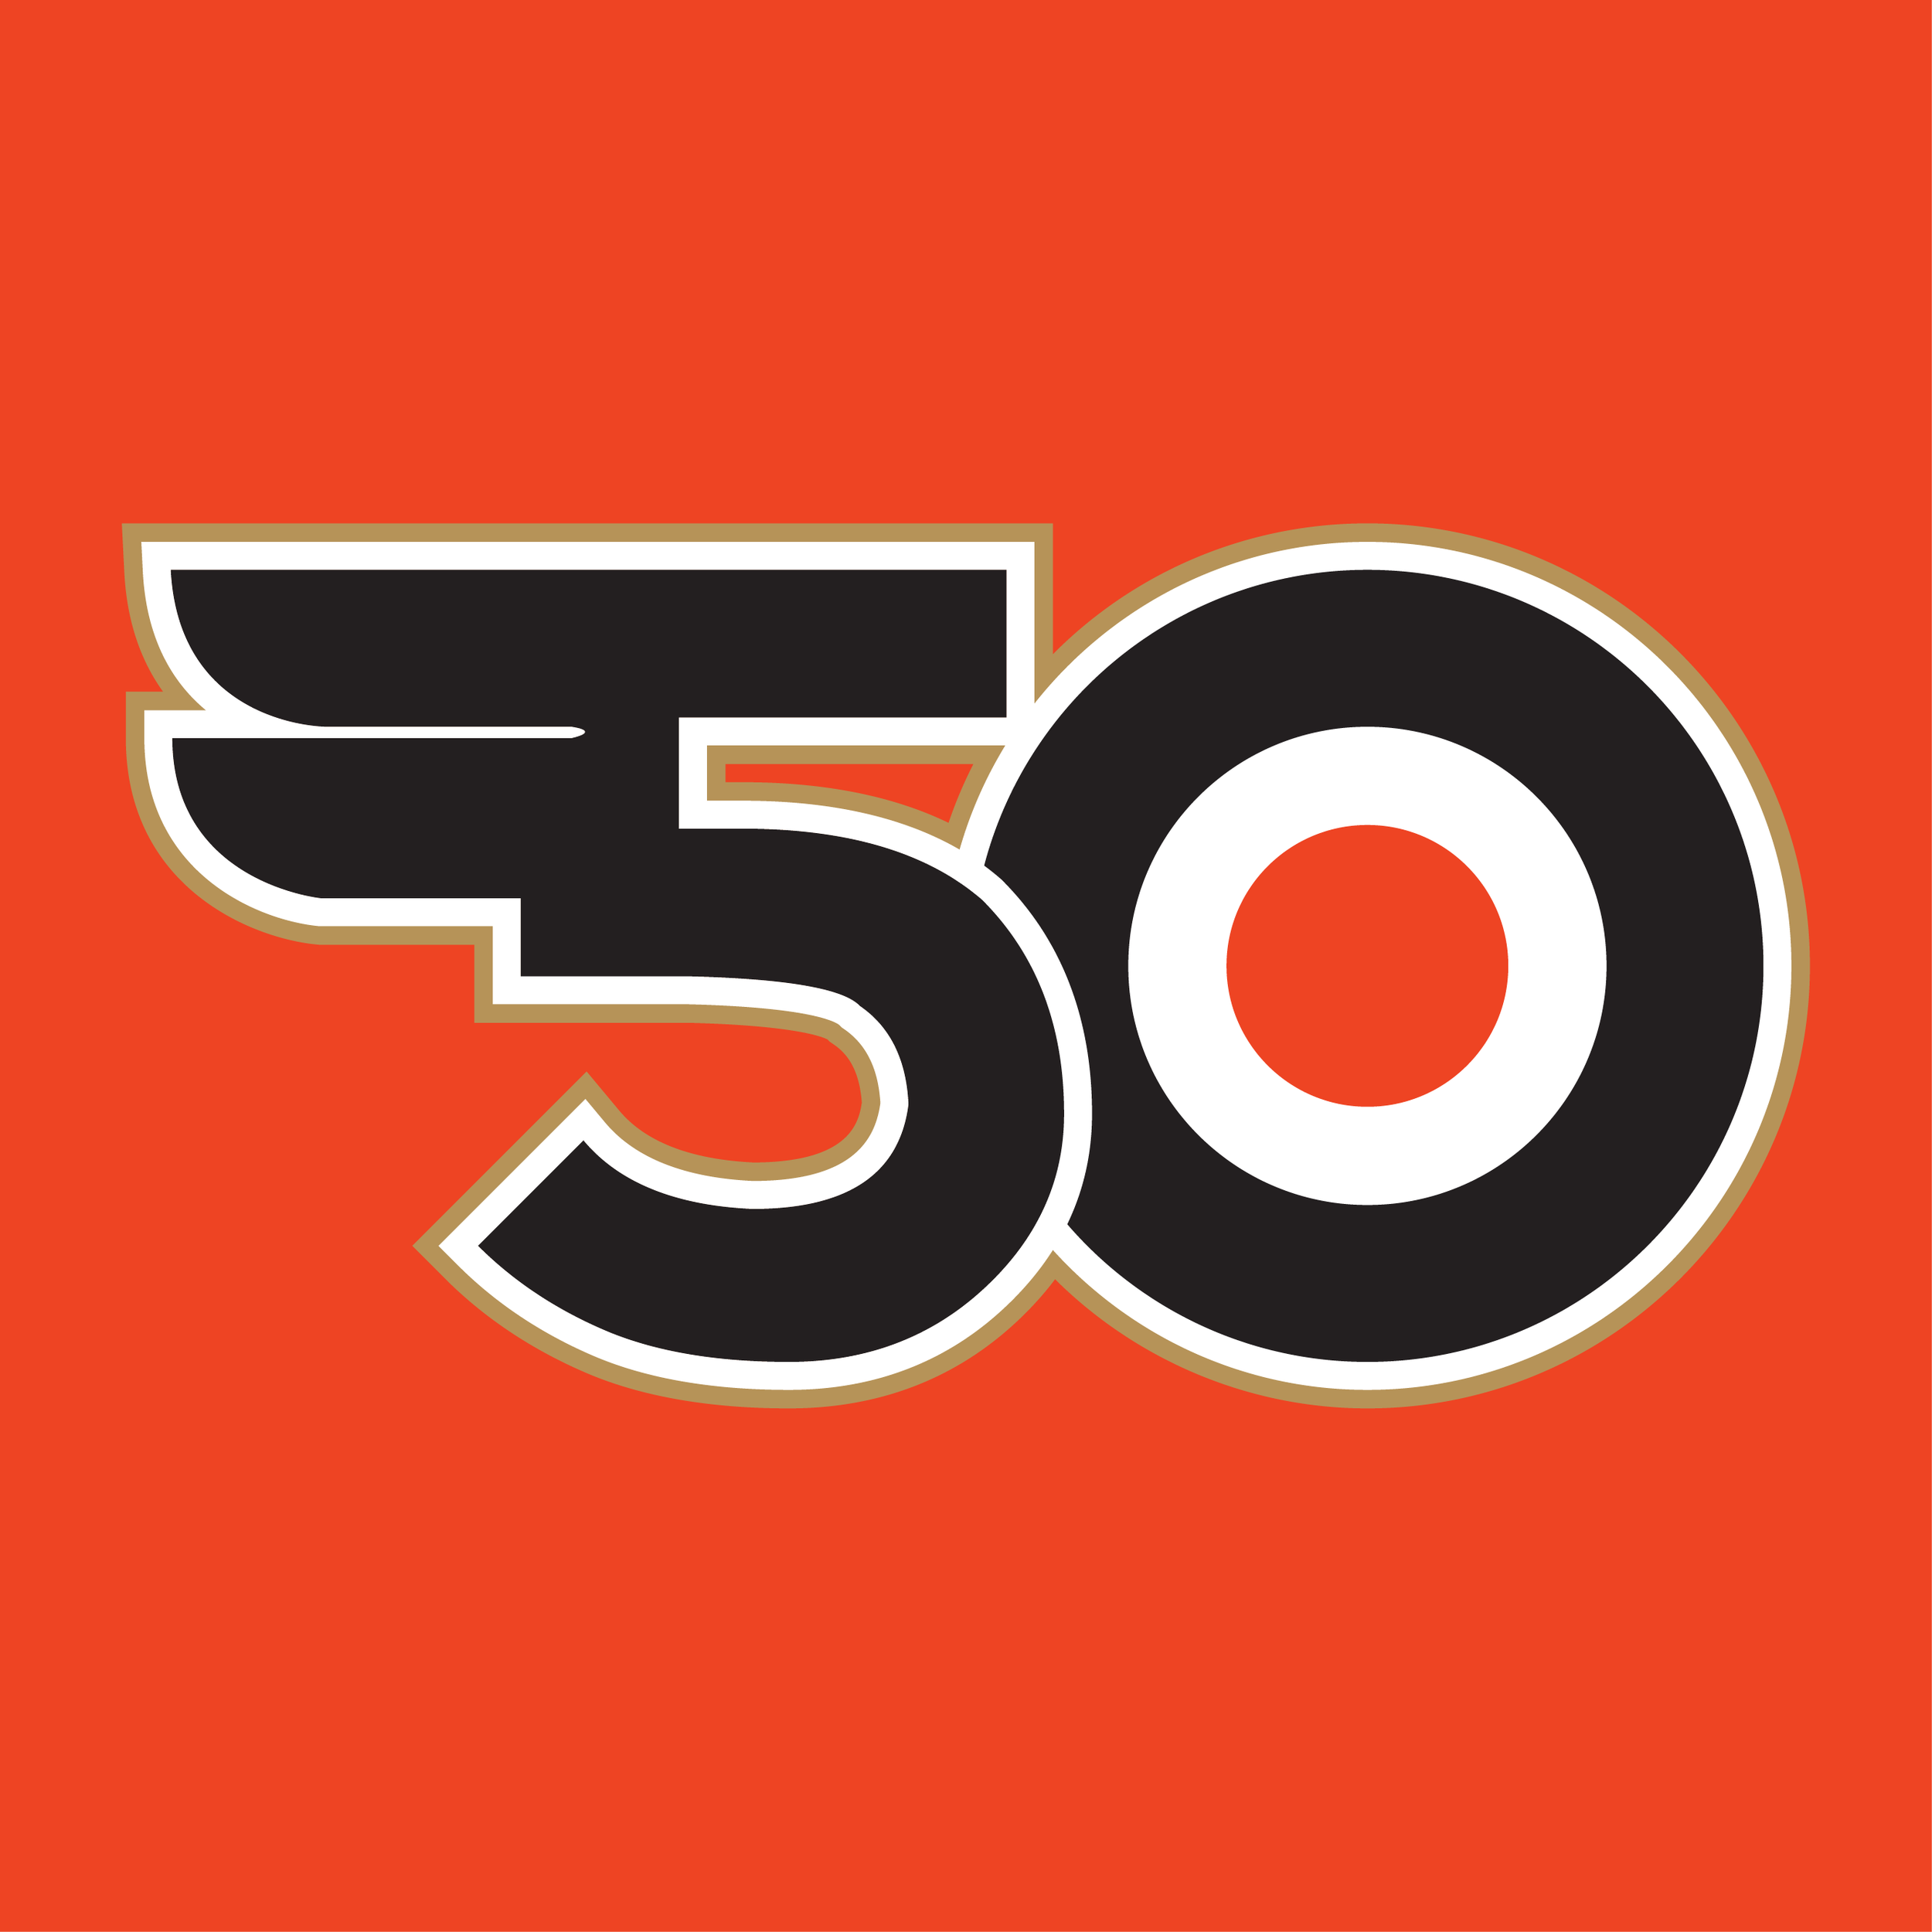 Philadelphia Flyers 50th Anniversary Logo